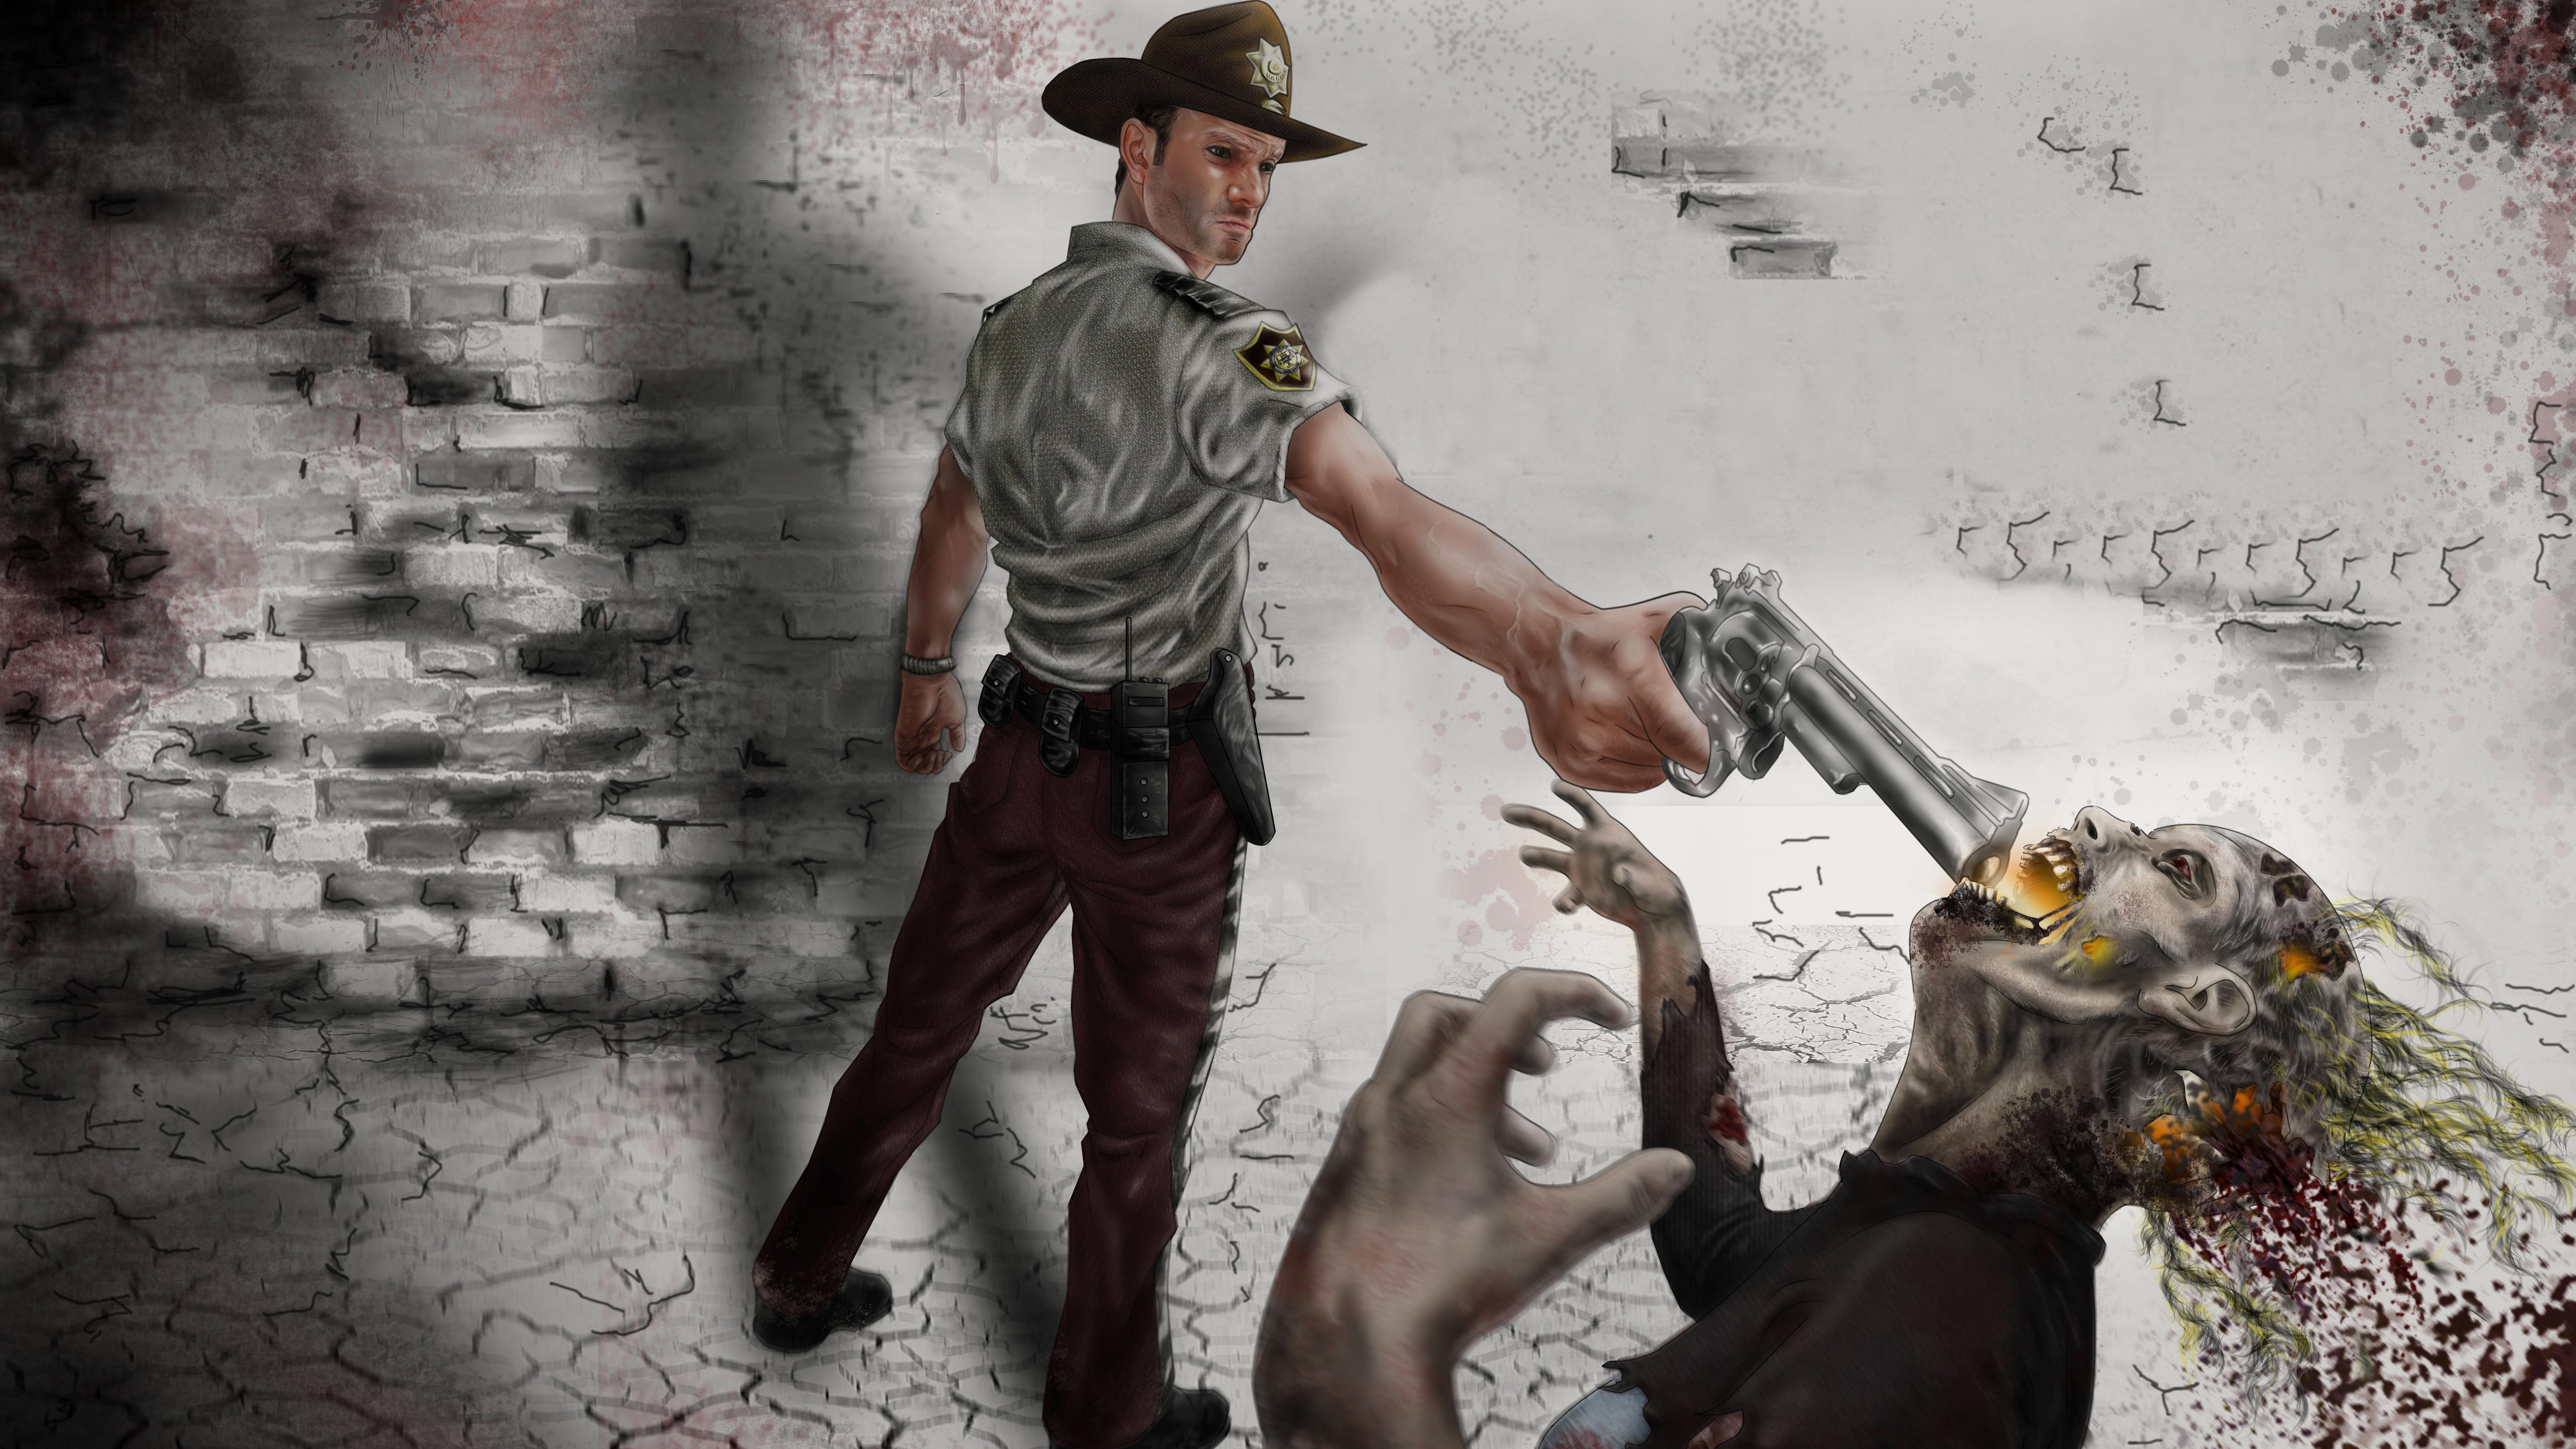 7680x4320 The Walking Dead 10k Artwork 8k Hd 4k Wallpapers Images